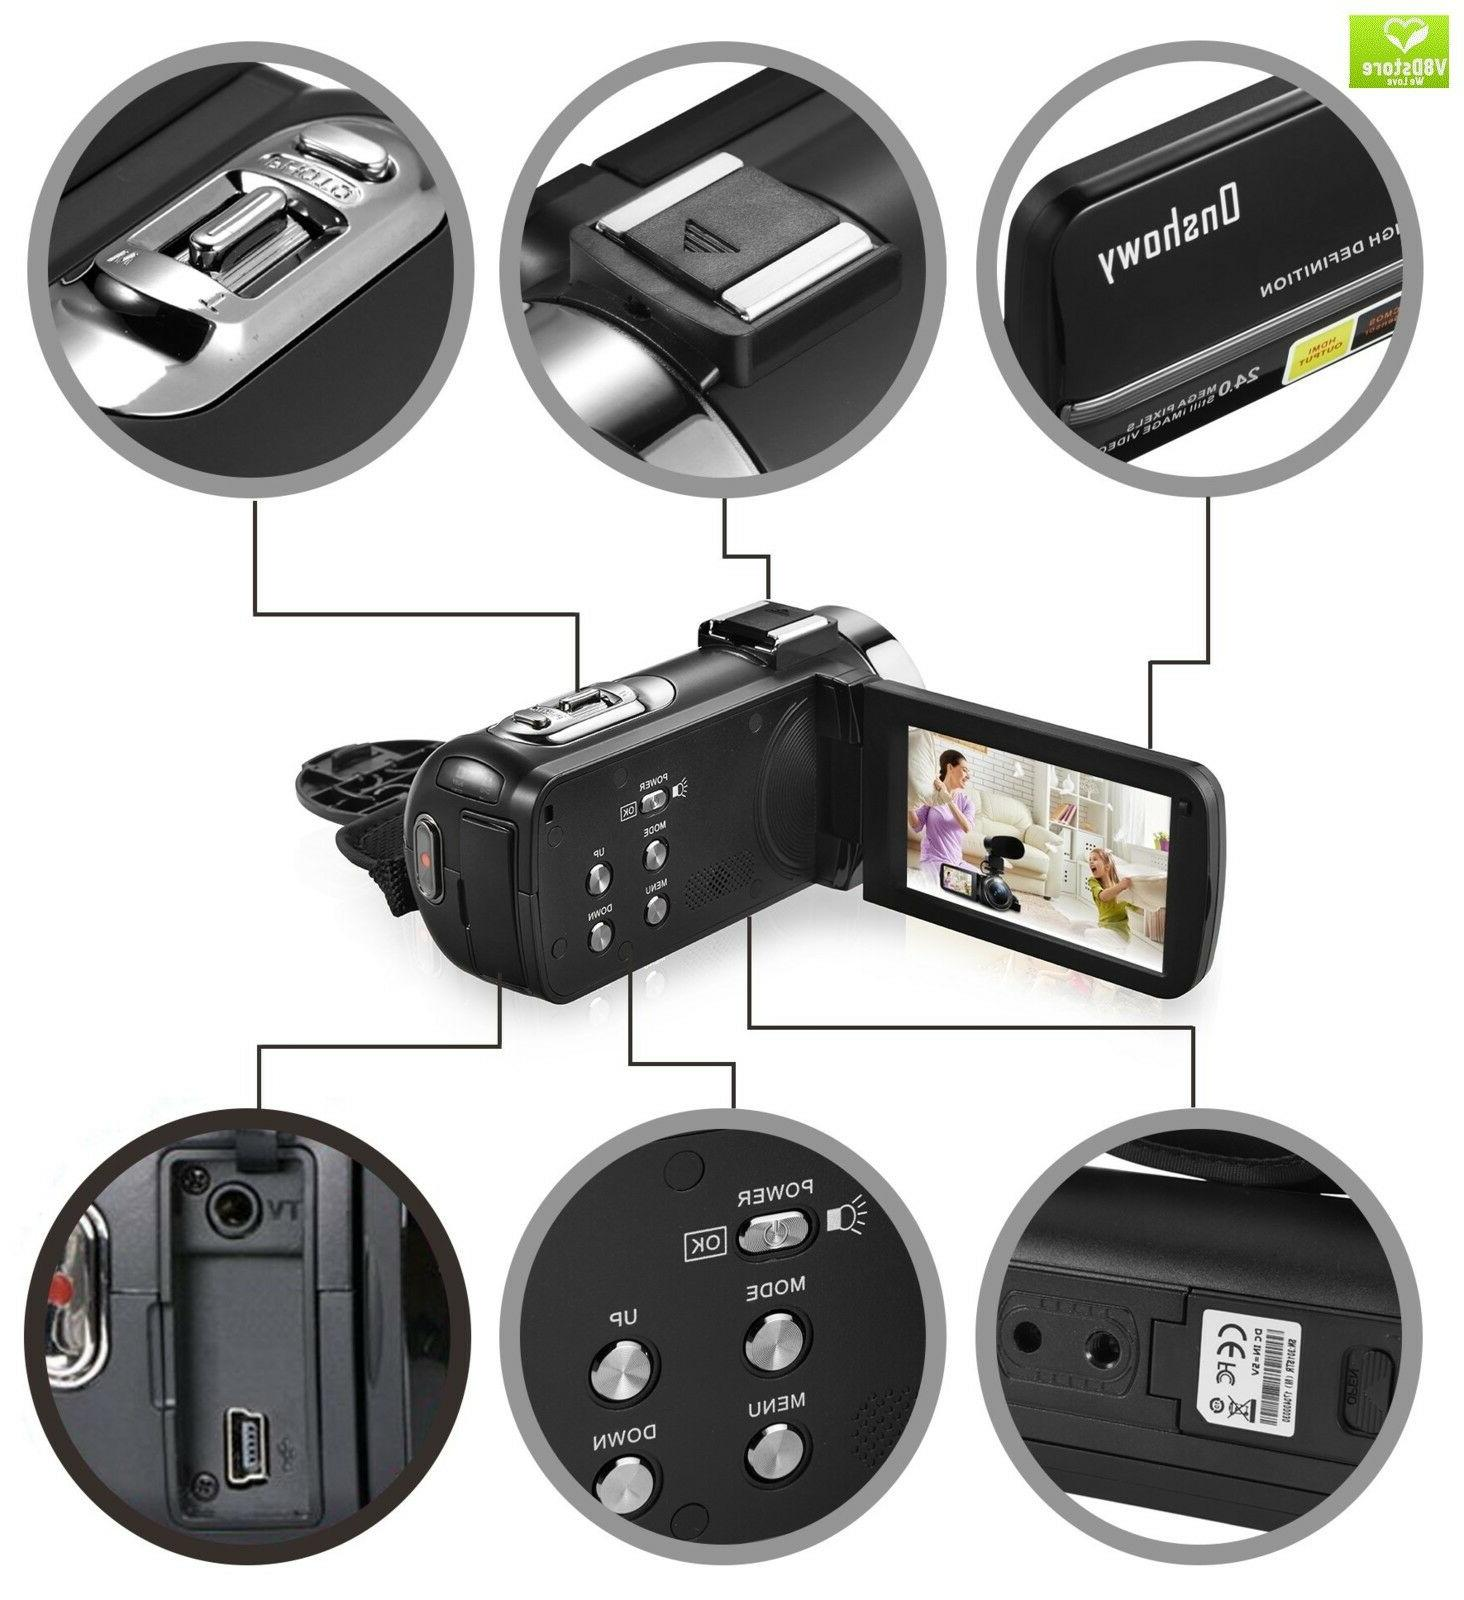 Camera Camcorder,Onshowy Infrared Night Vision Camera HD 10